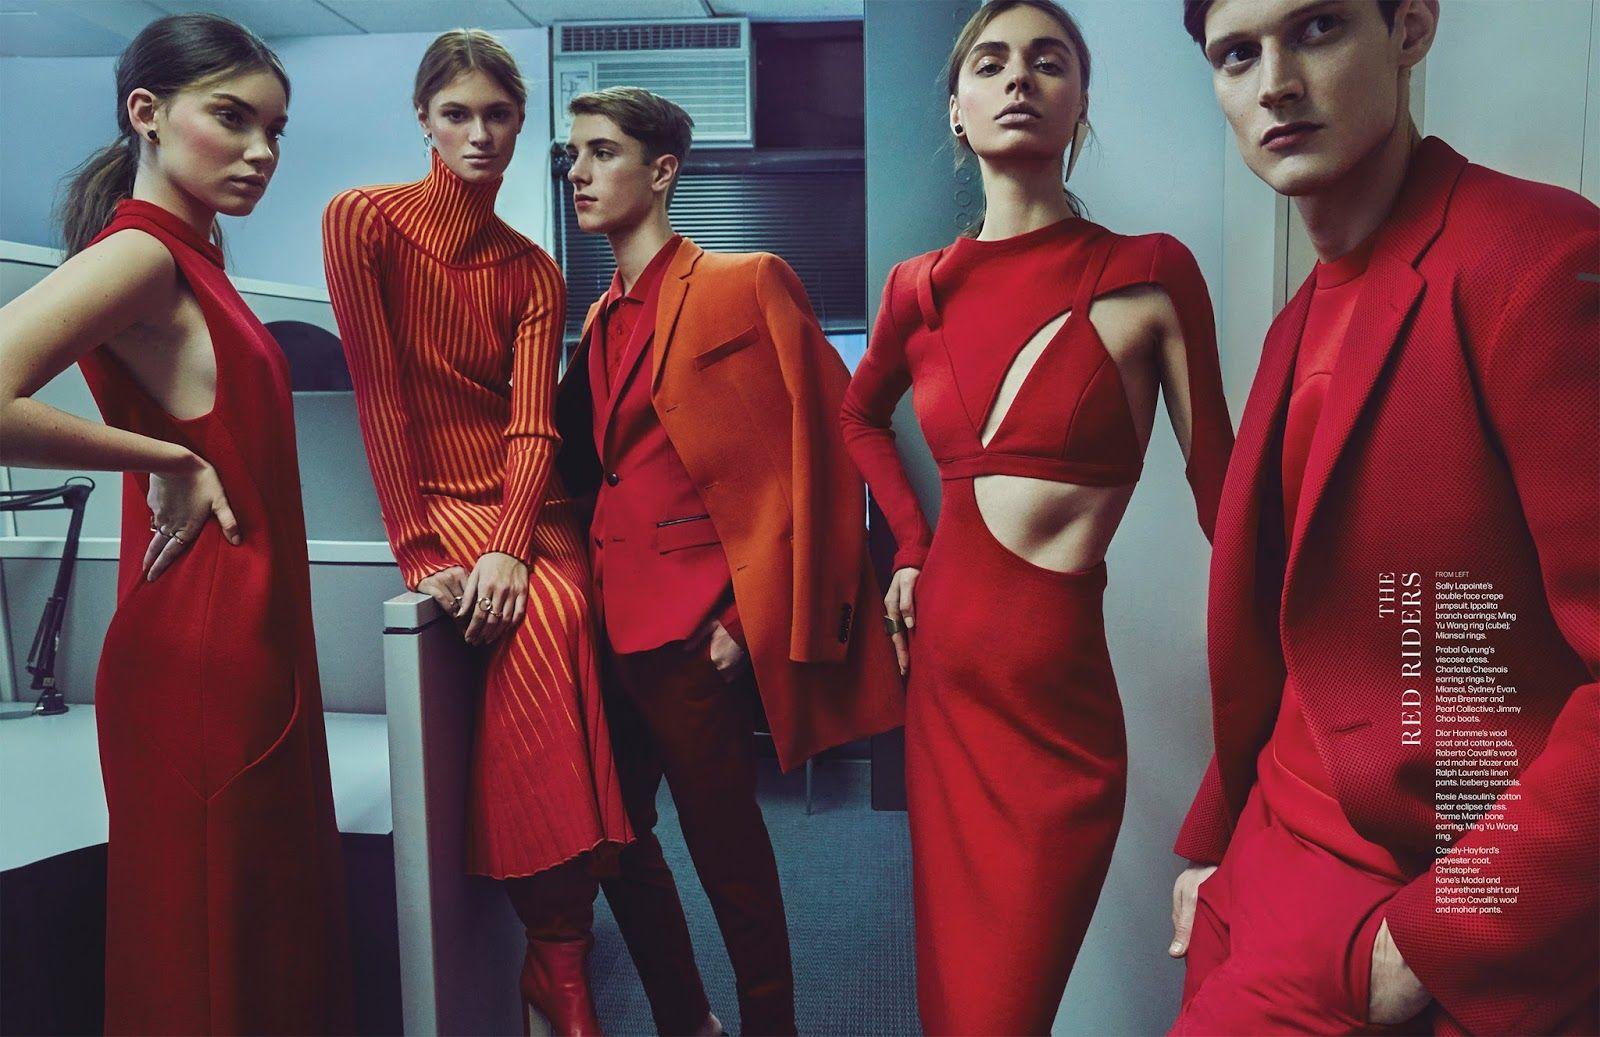 Fashion tribes: Lera Bubleyko, Freja Jeppesen, Tina Veshaguri, Adam Butcher and Frank Rossi by An Le for WWD december 2015